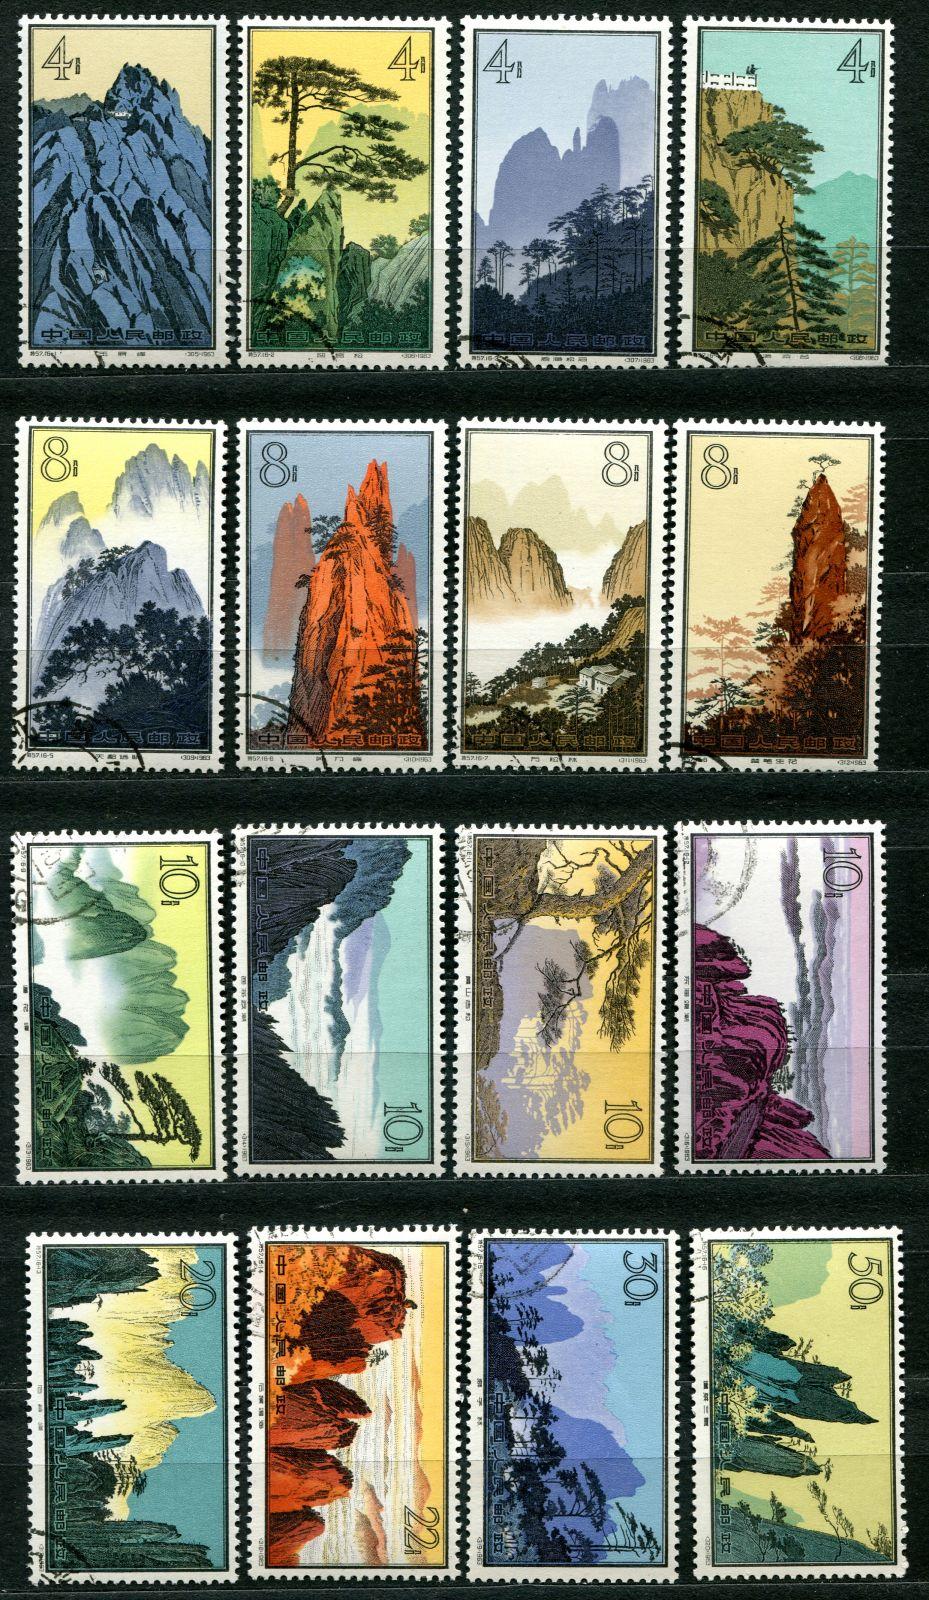 (1963) MiNr. 744-759 - O - Čína - Krajinky z Huangshan